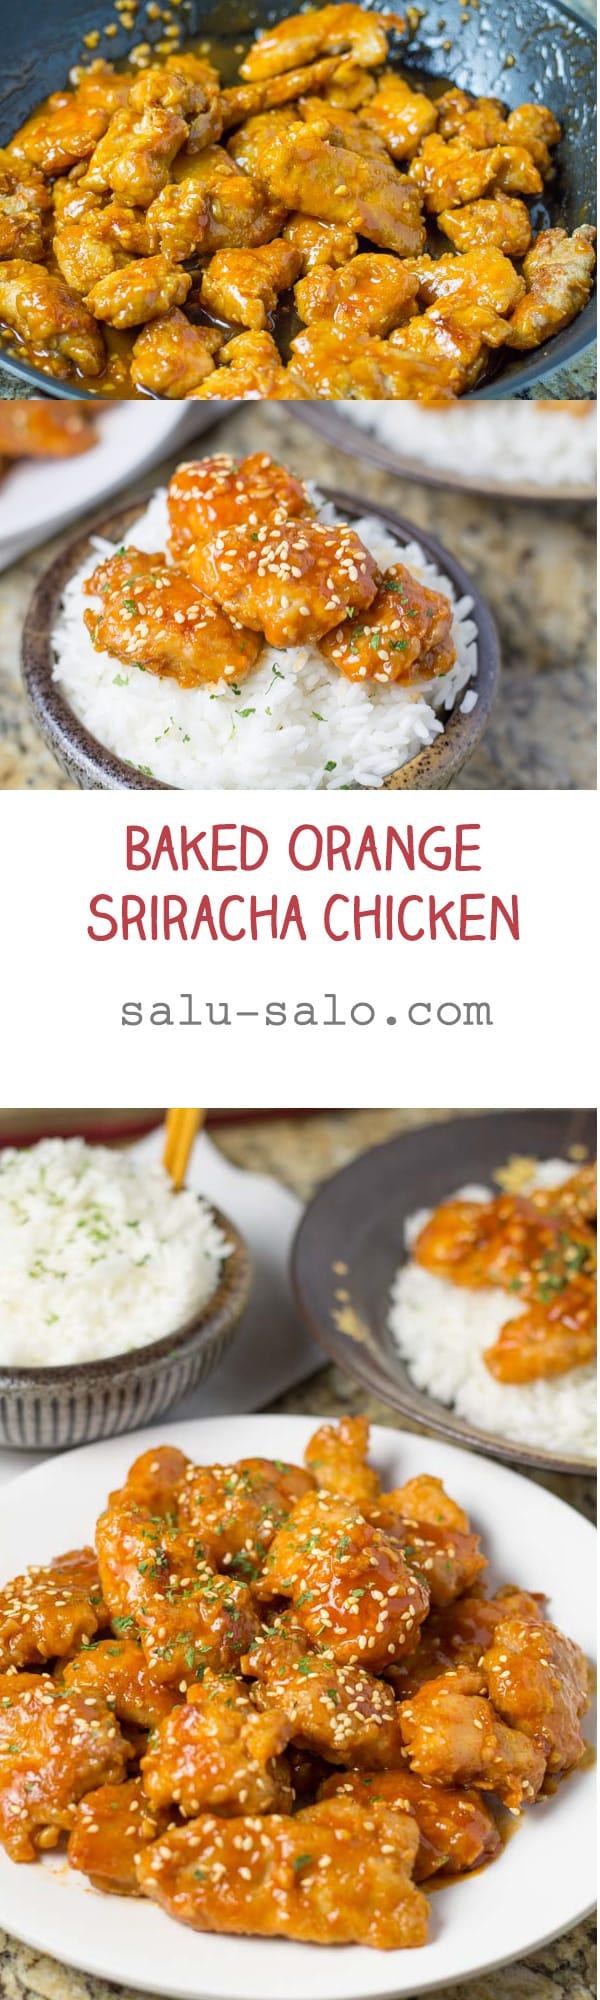 Baked Orange Sriracha Chicken